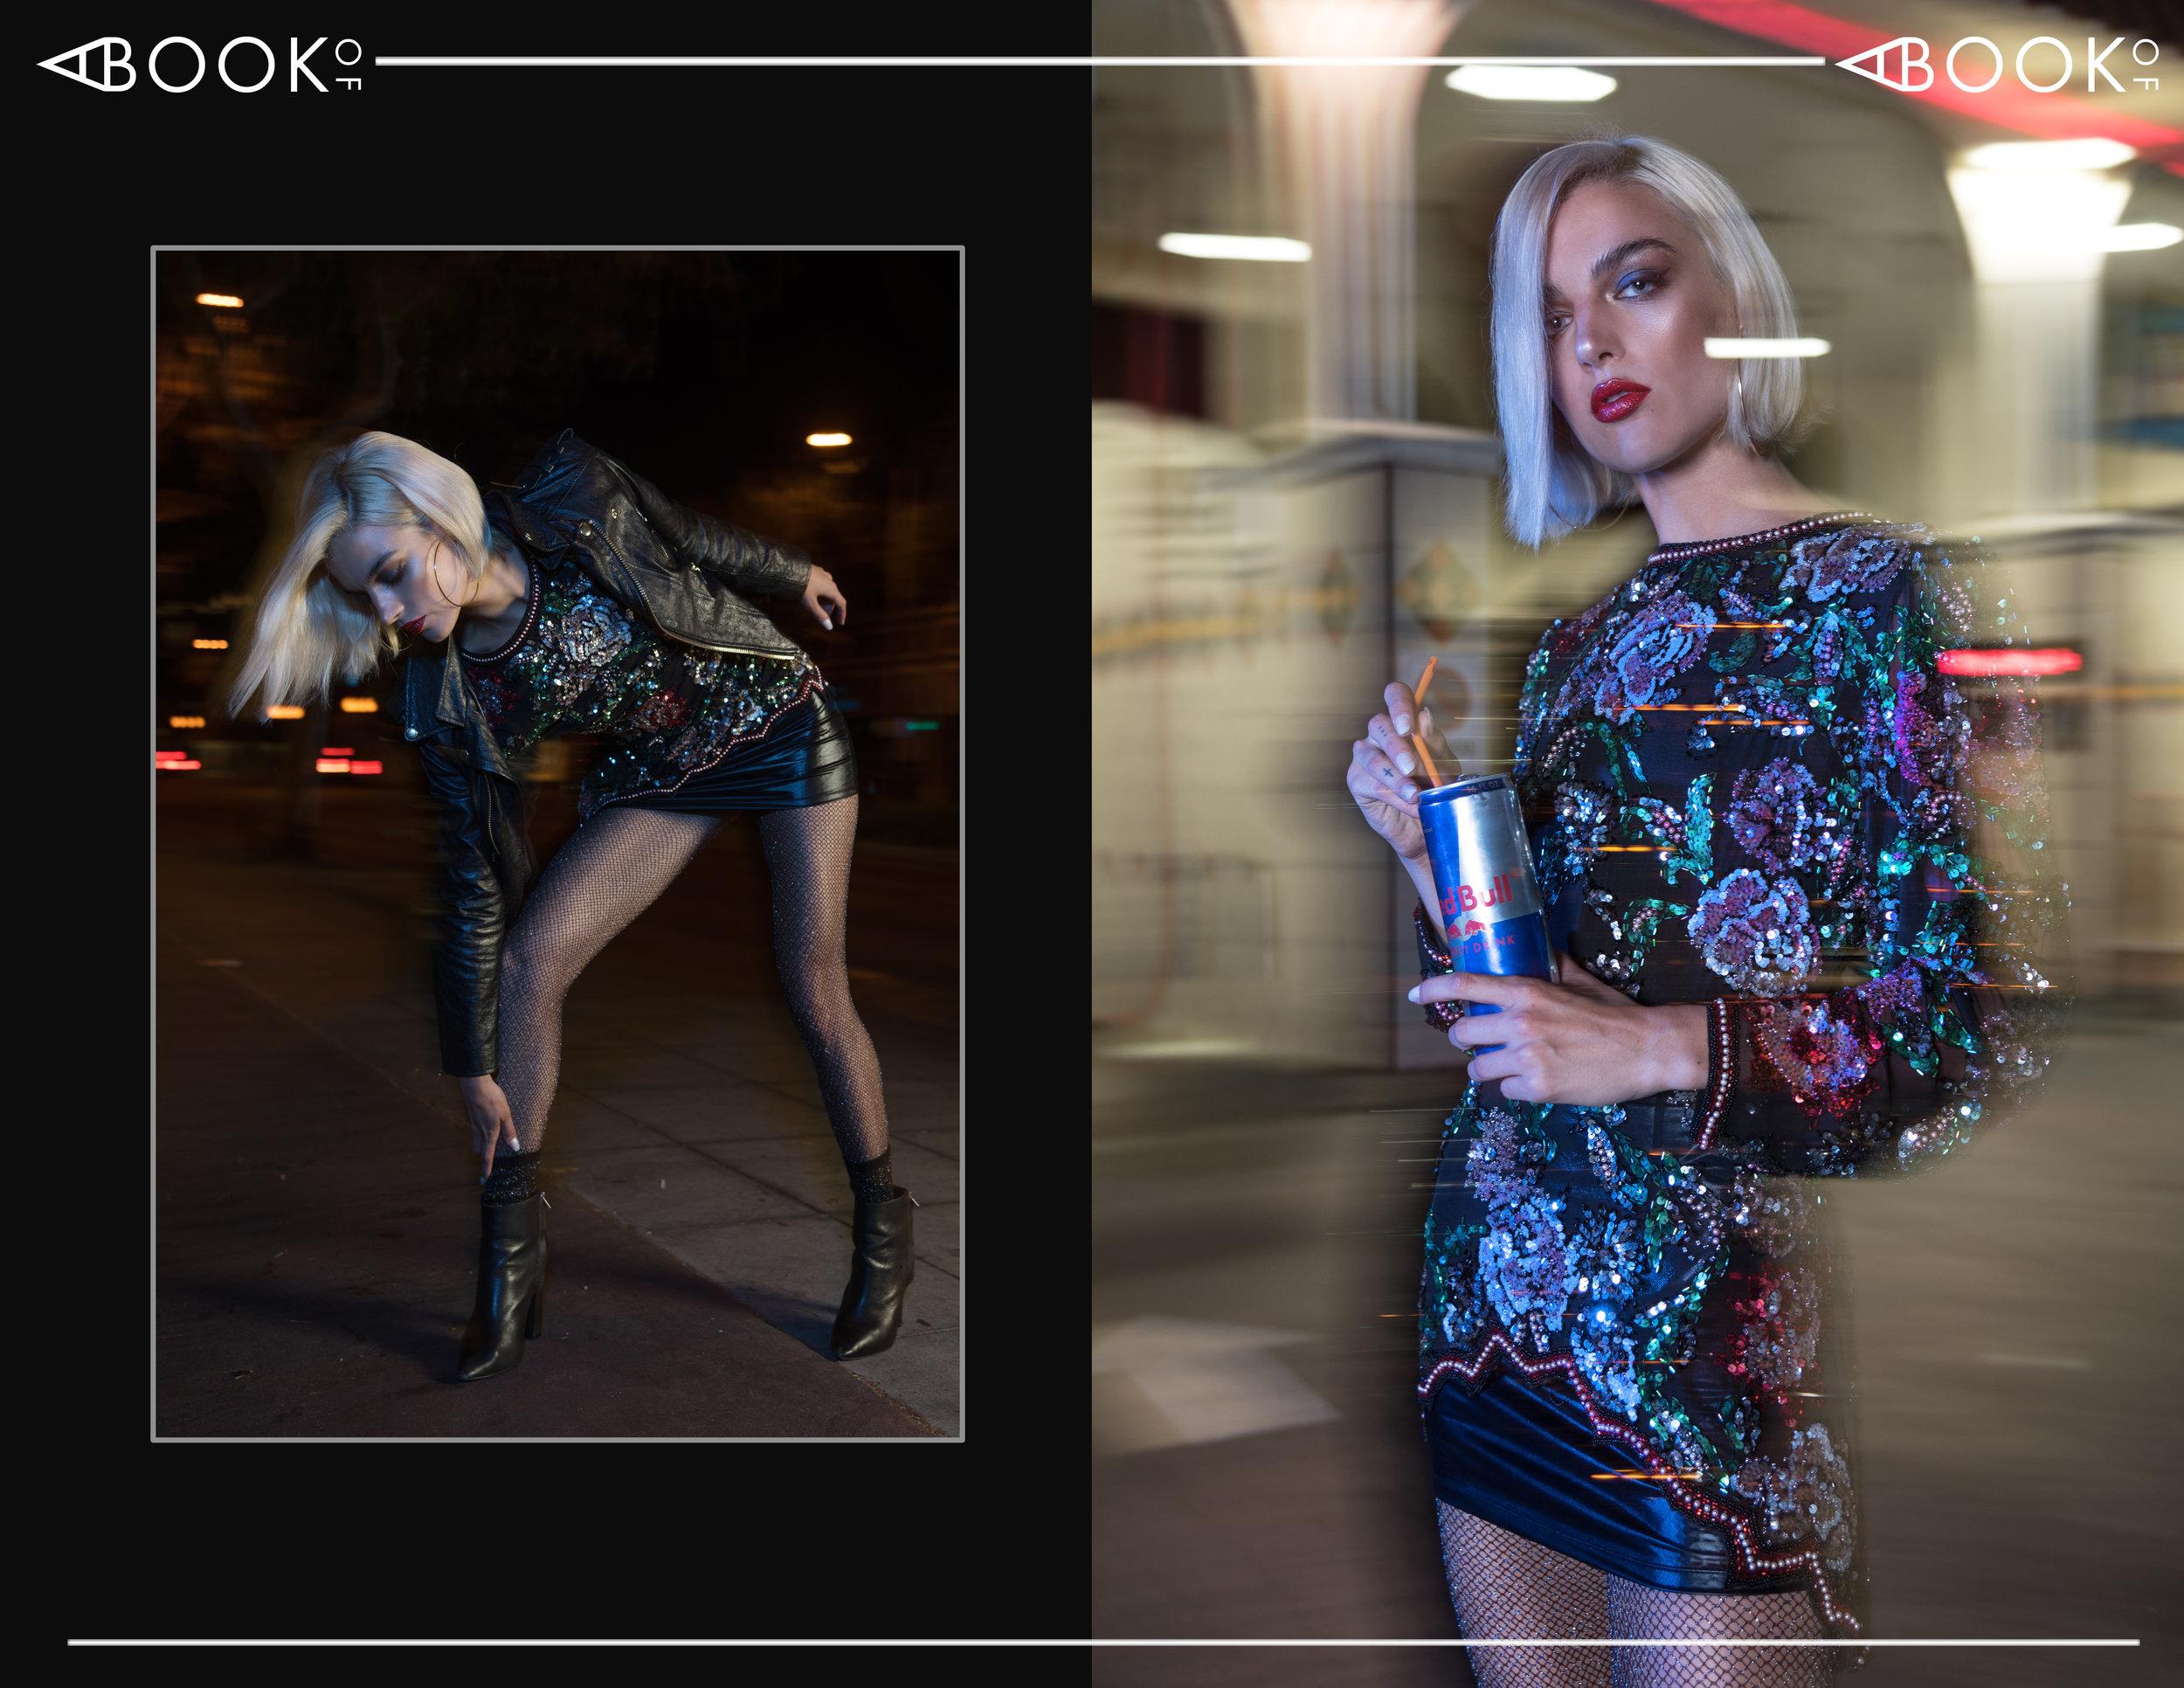 Top - Vintage | Skirt - Syren | Jacket - Alexia Ulibarri | Booties- Chloe